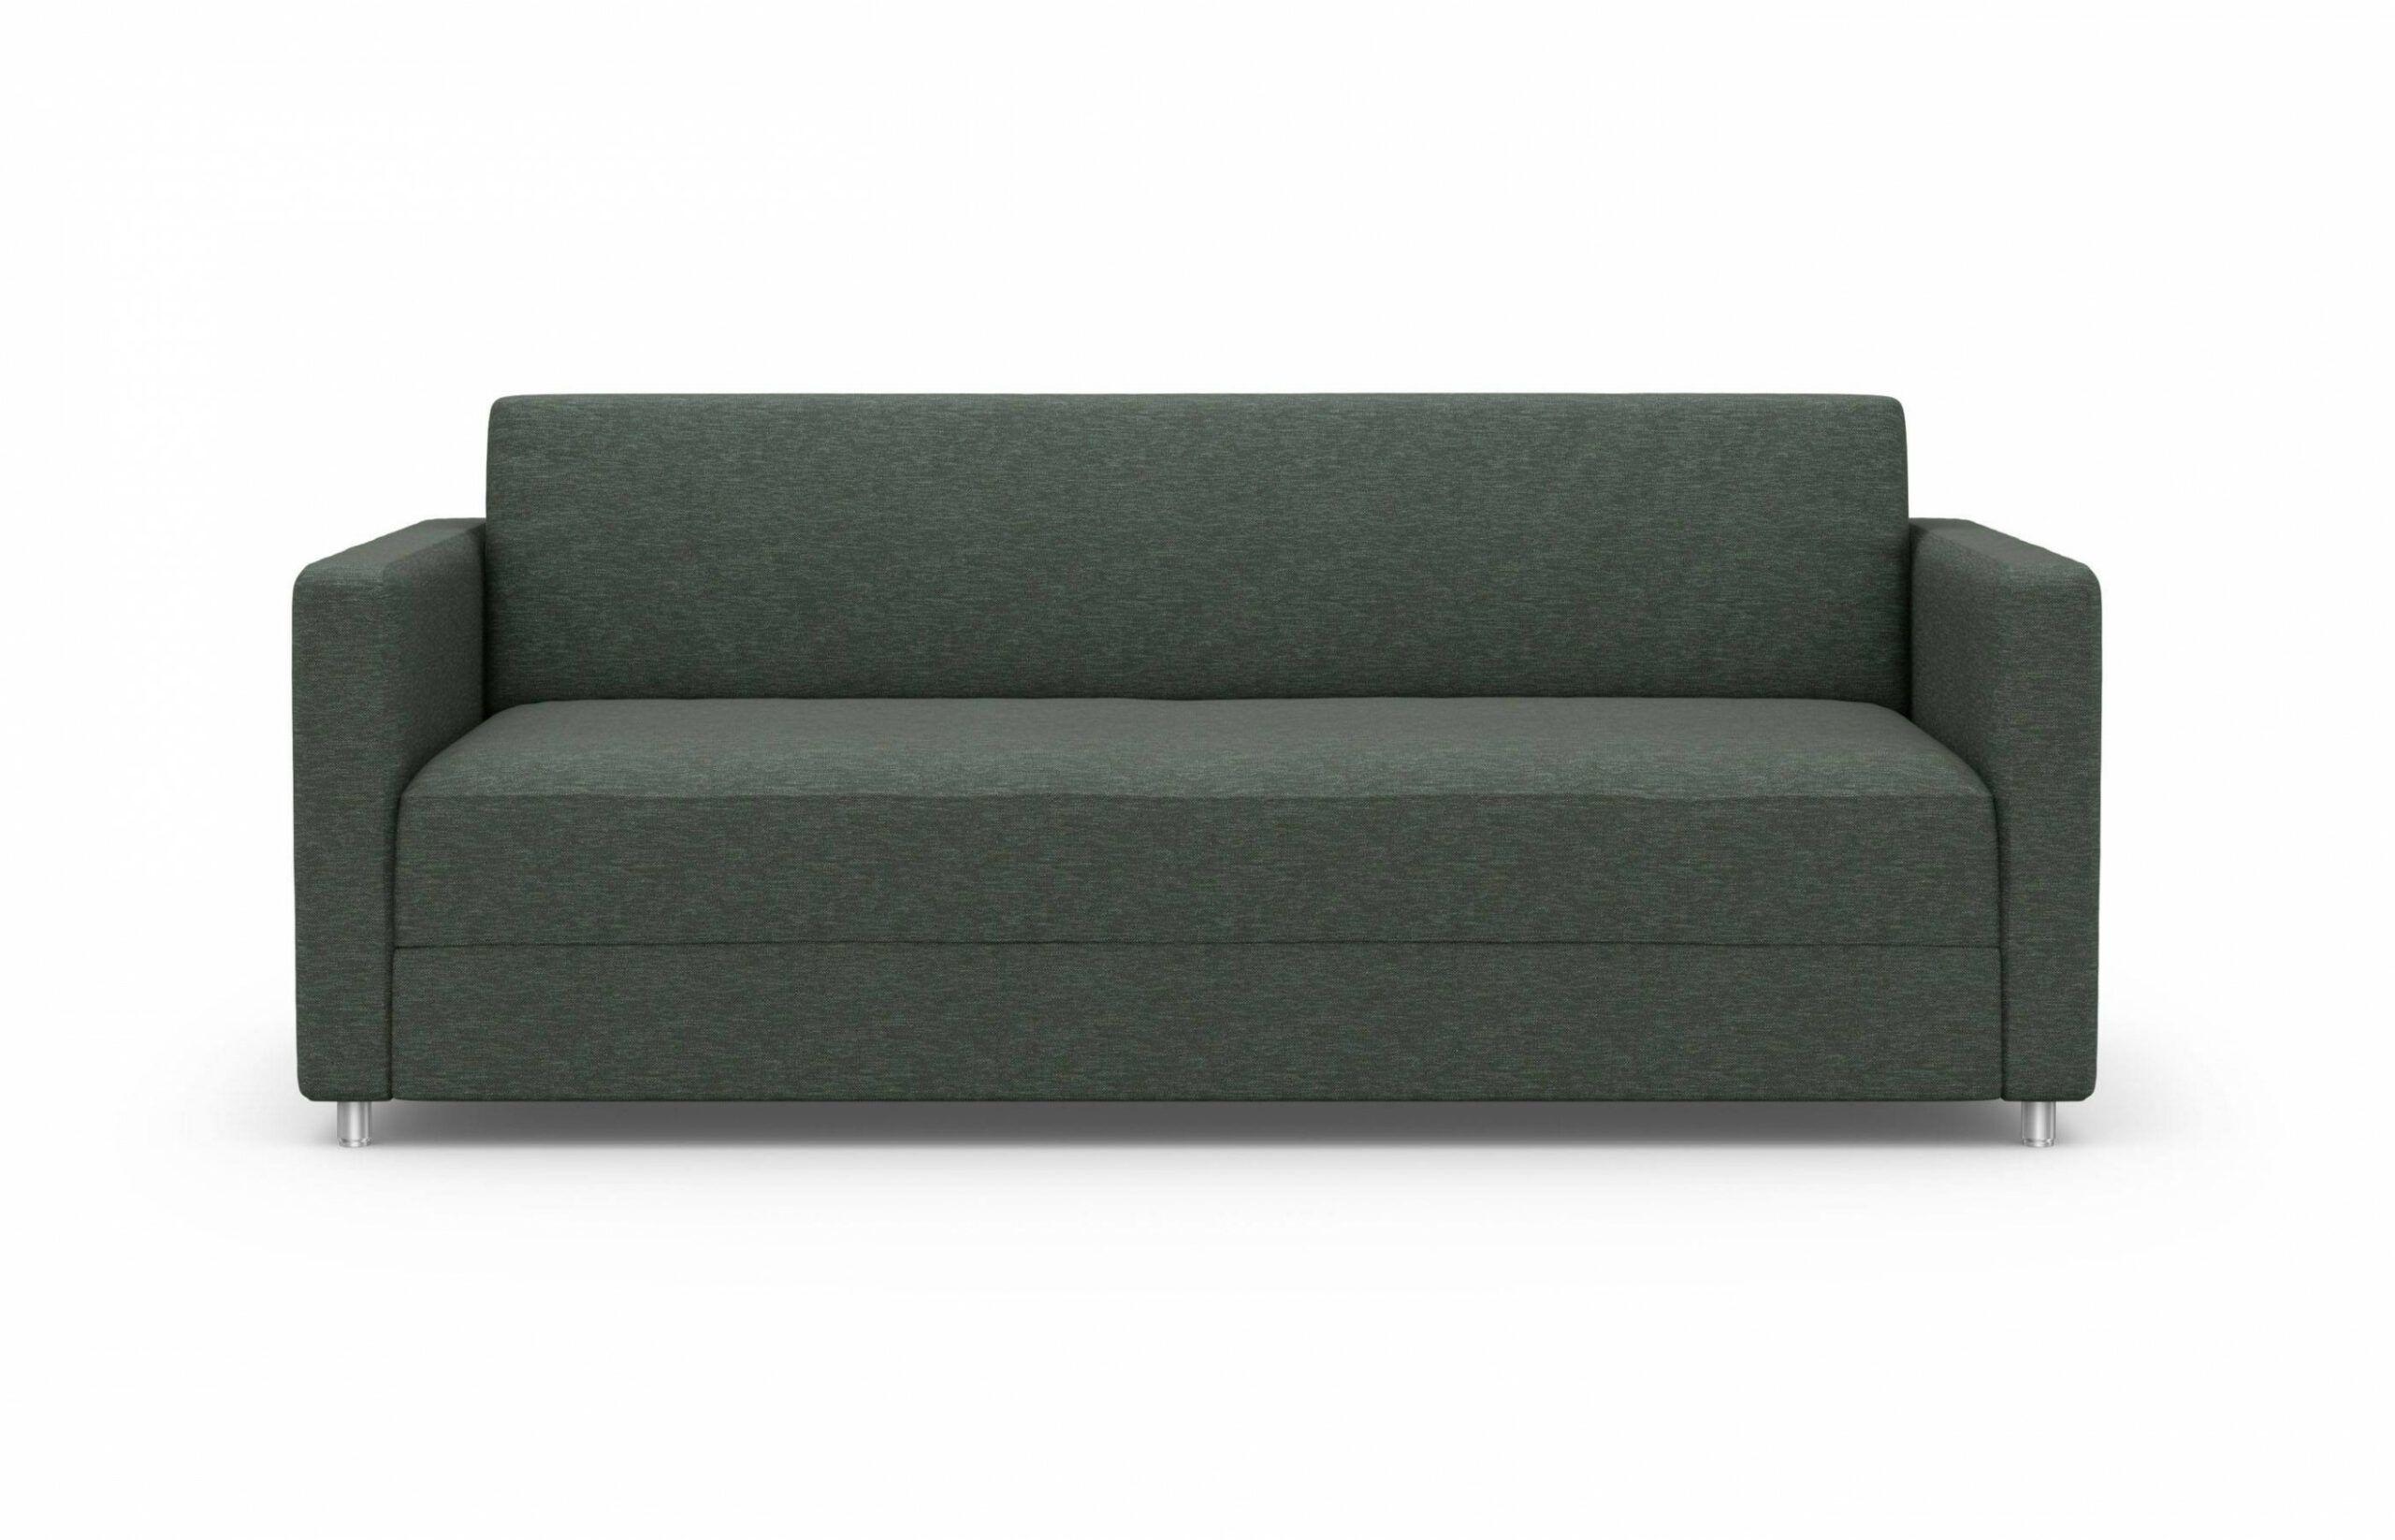 Muji Wooden Sofa Bed Wooden Sofa Sofa Bed Muji Bed